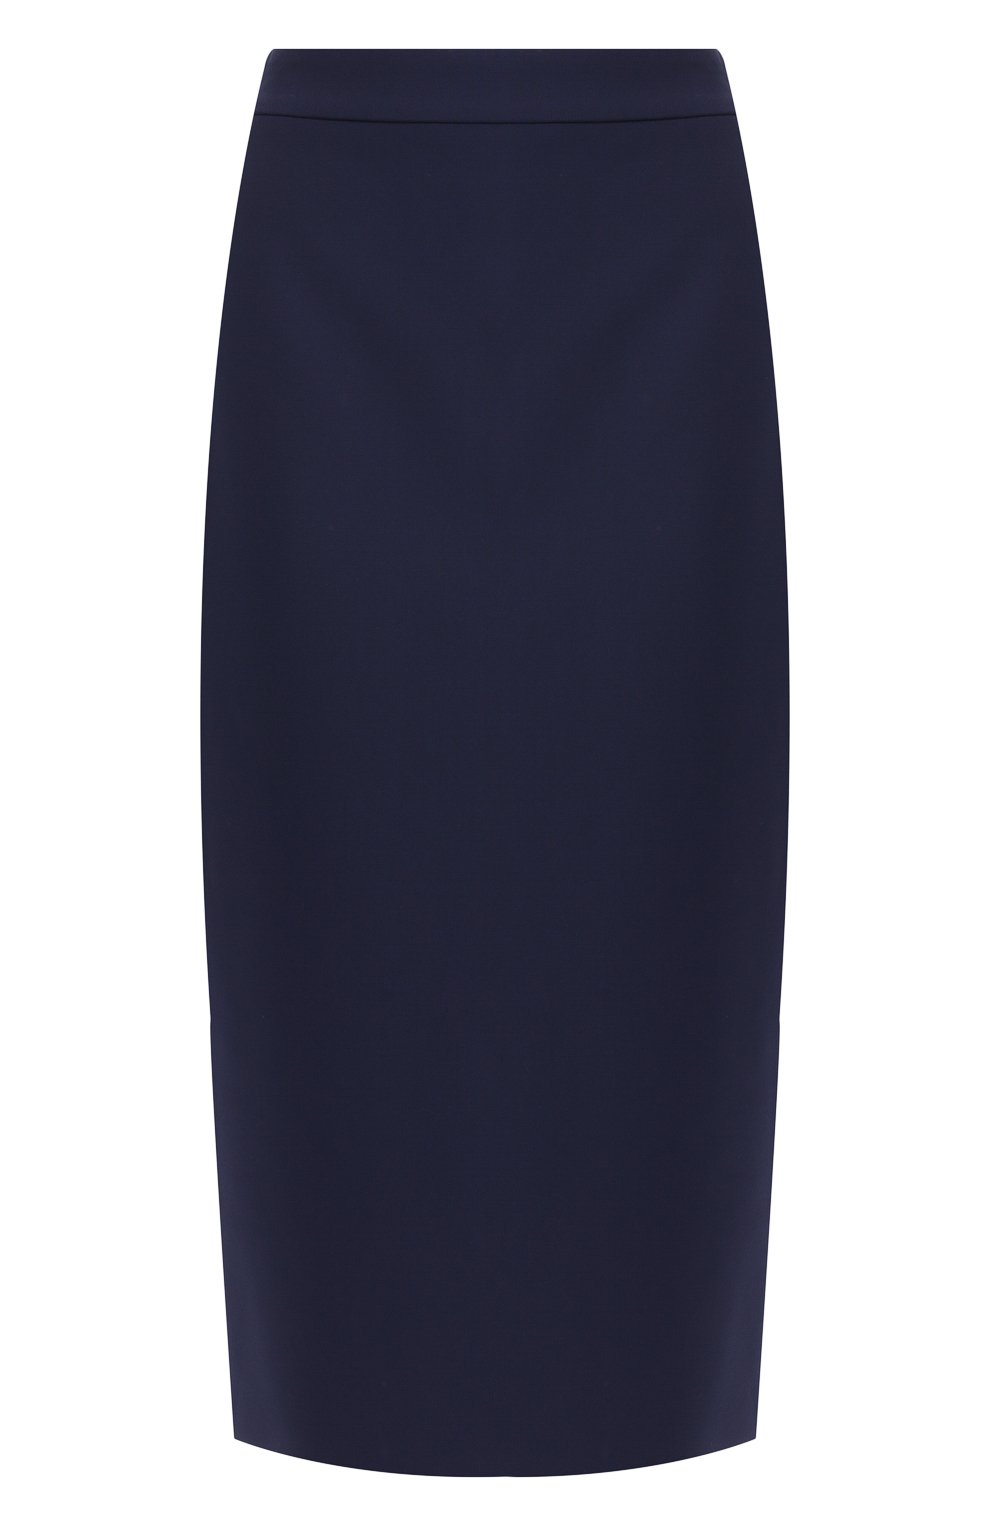 Женская юбка-карандаш BOSS синего цвета, арт. 50400538 | Фото 1